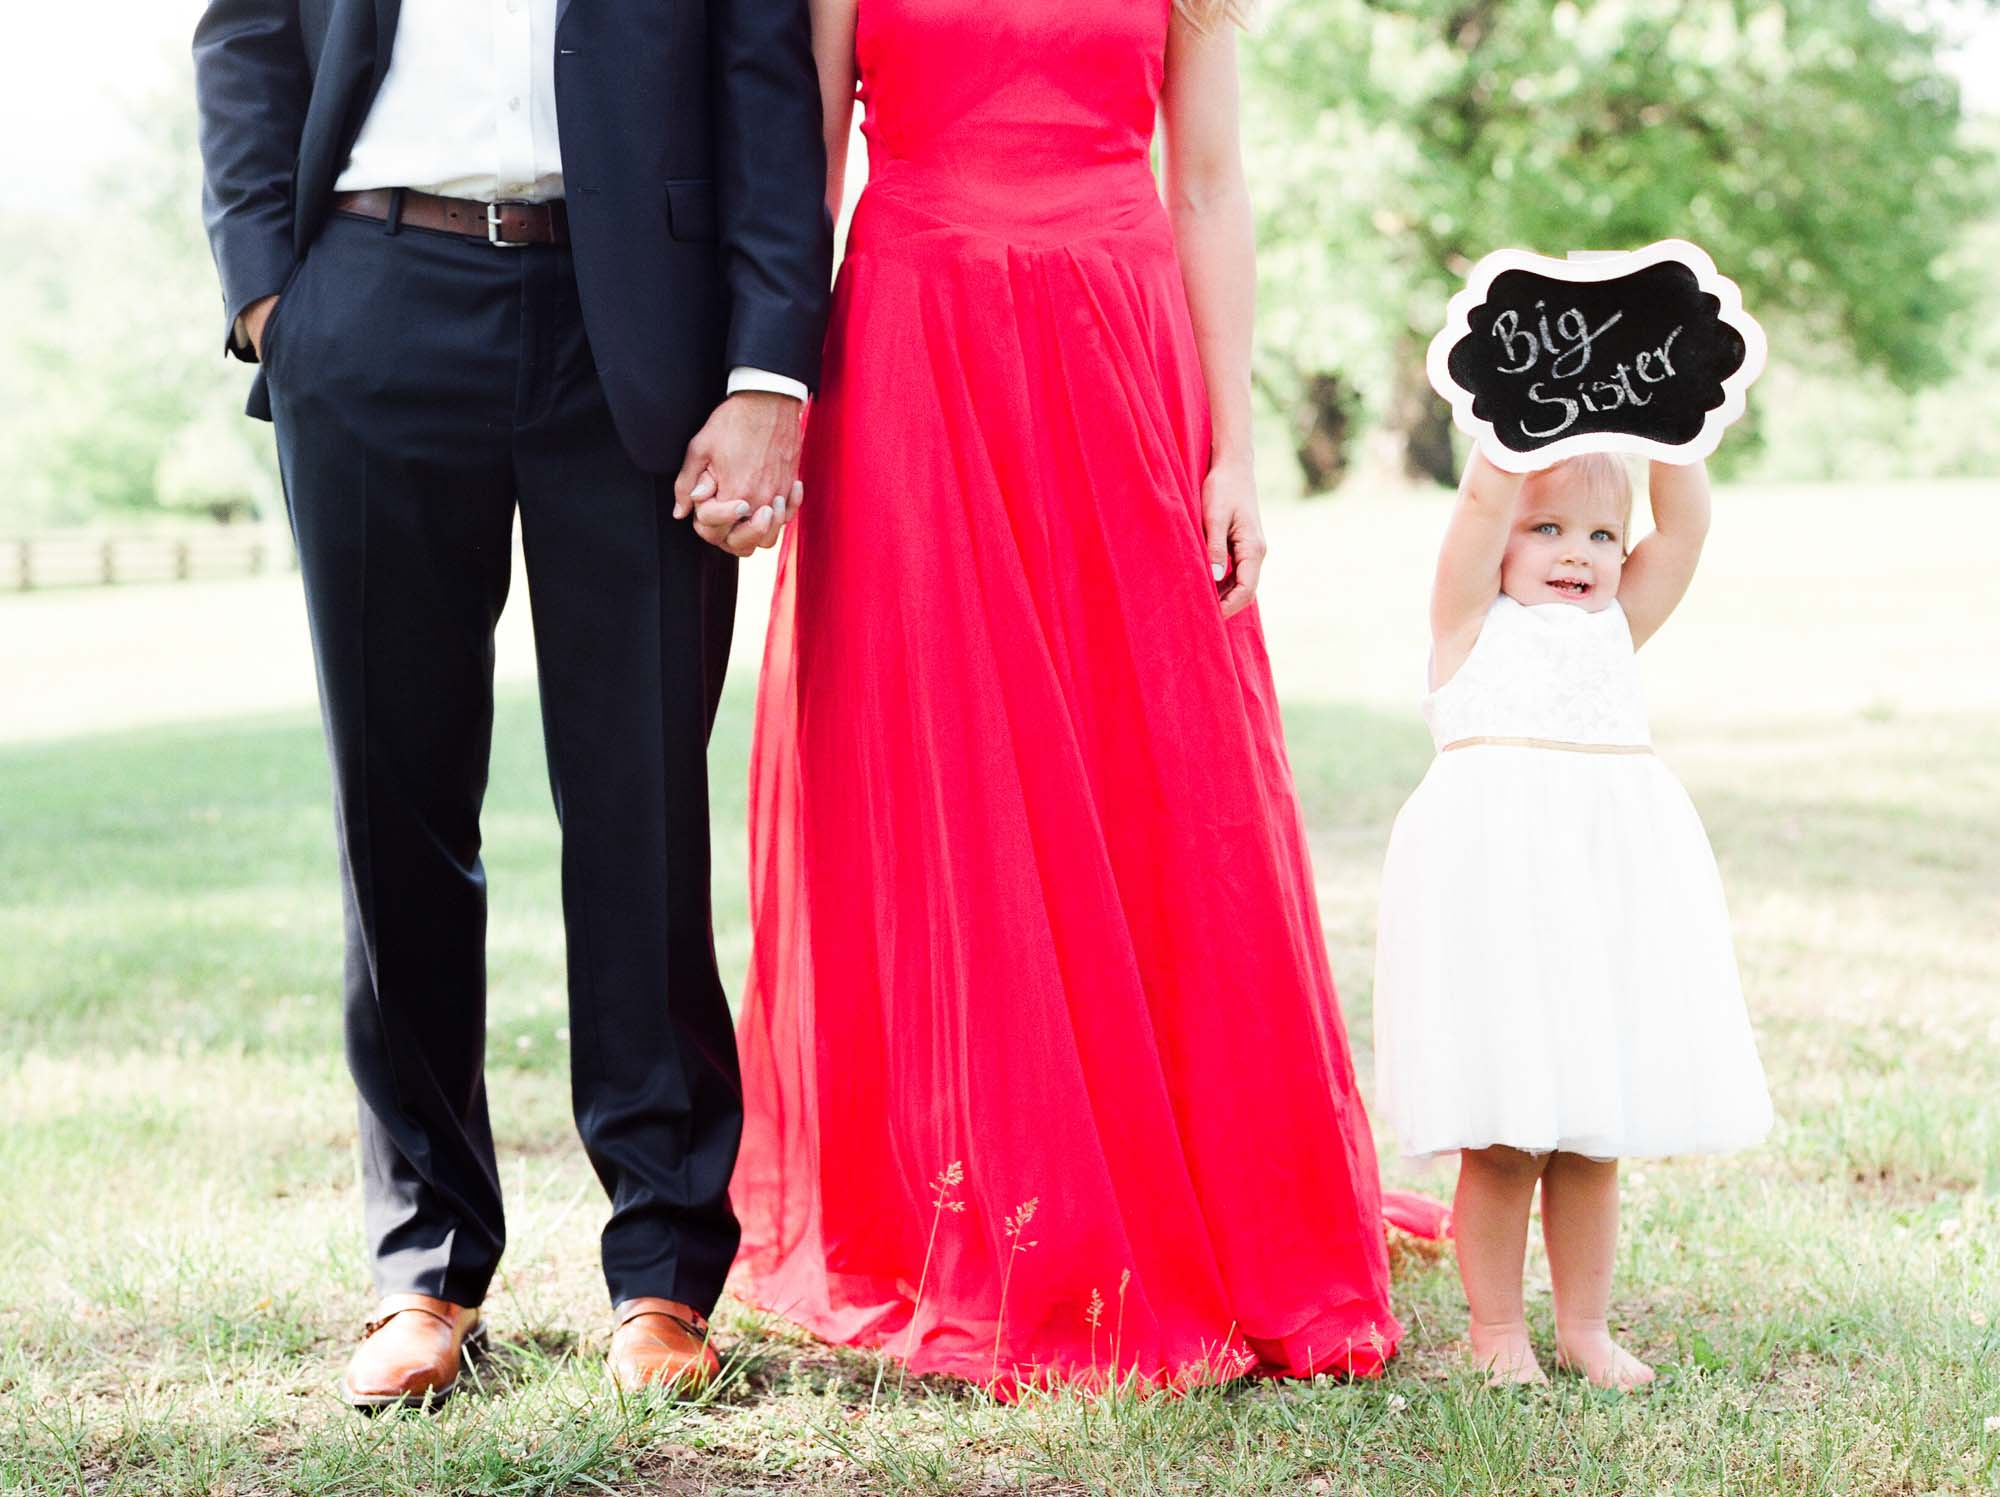 charlotte_lynchburg_film_family_wedding_photographer-1-2.jpg